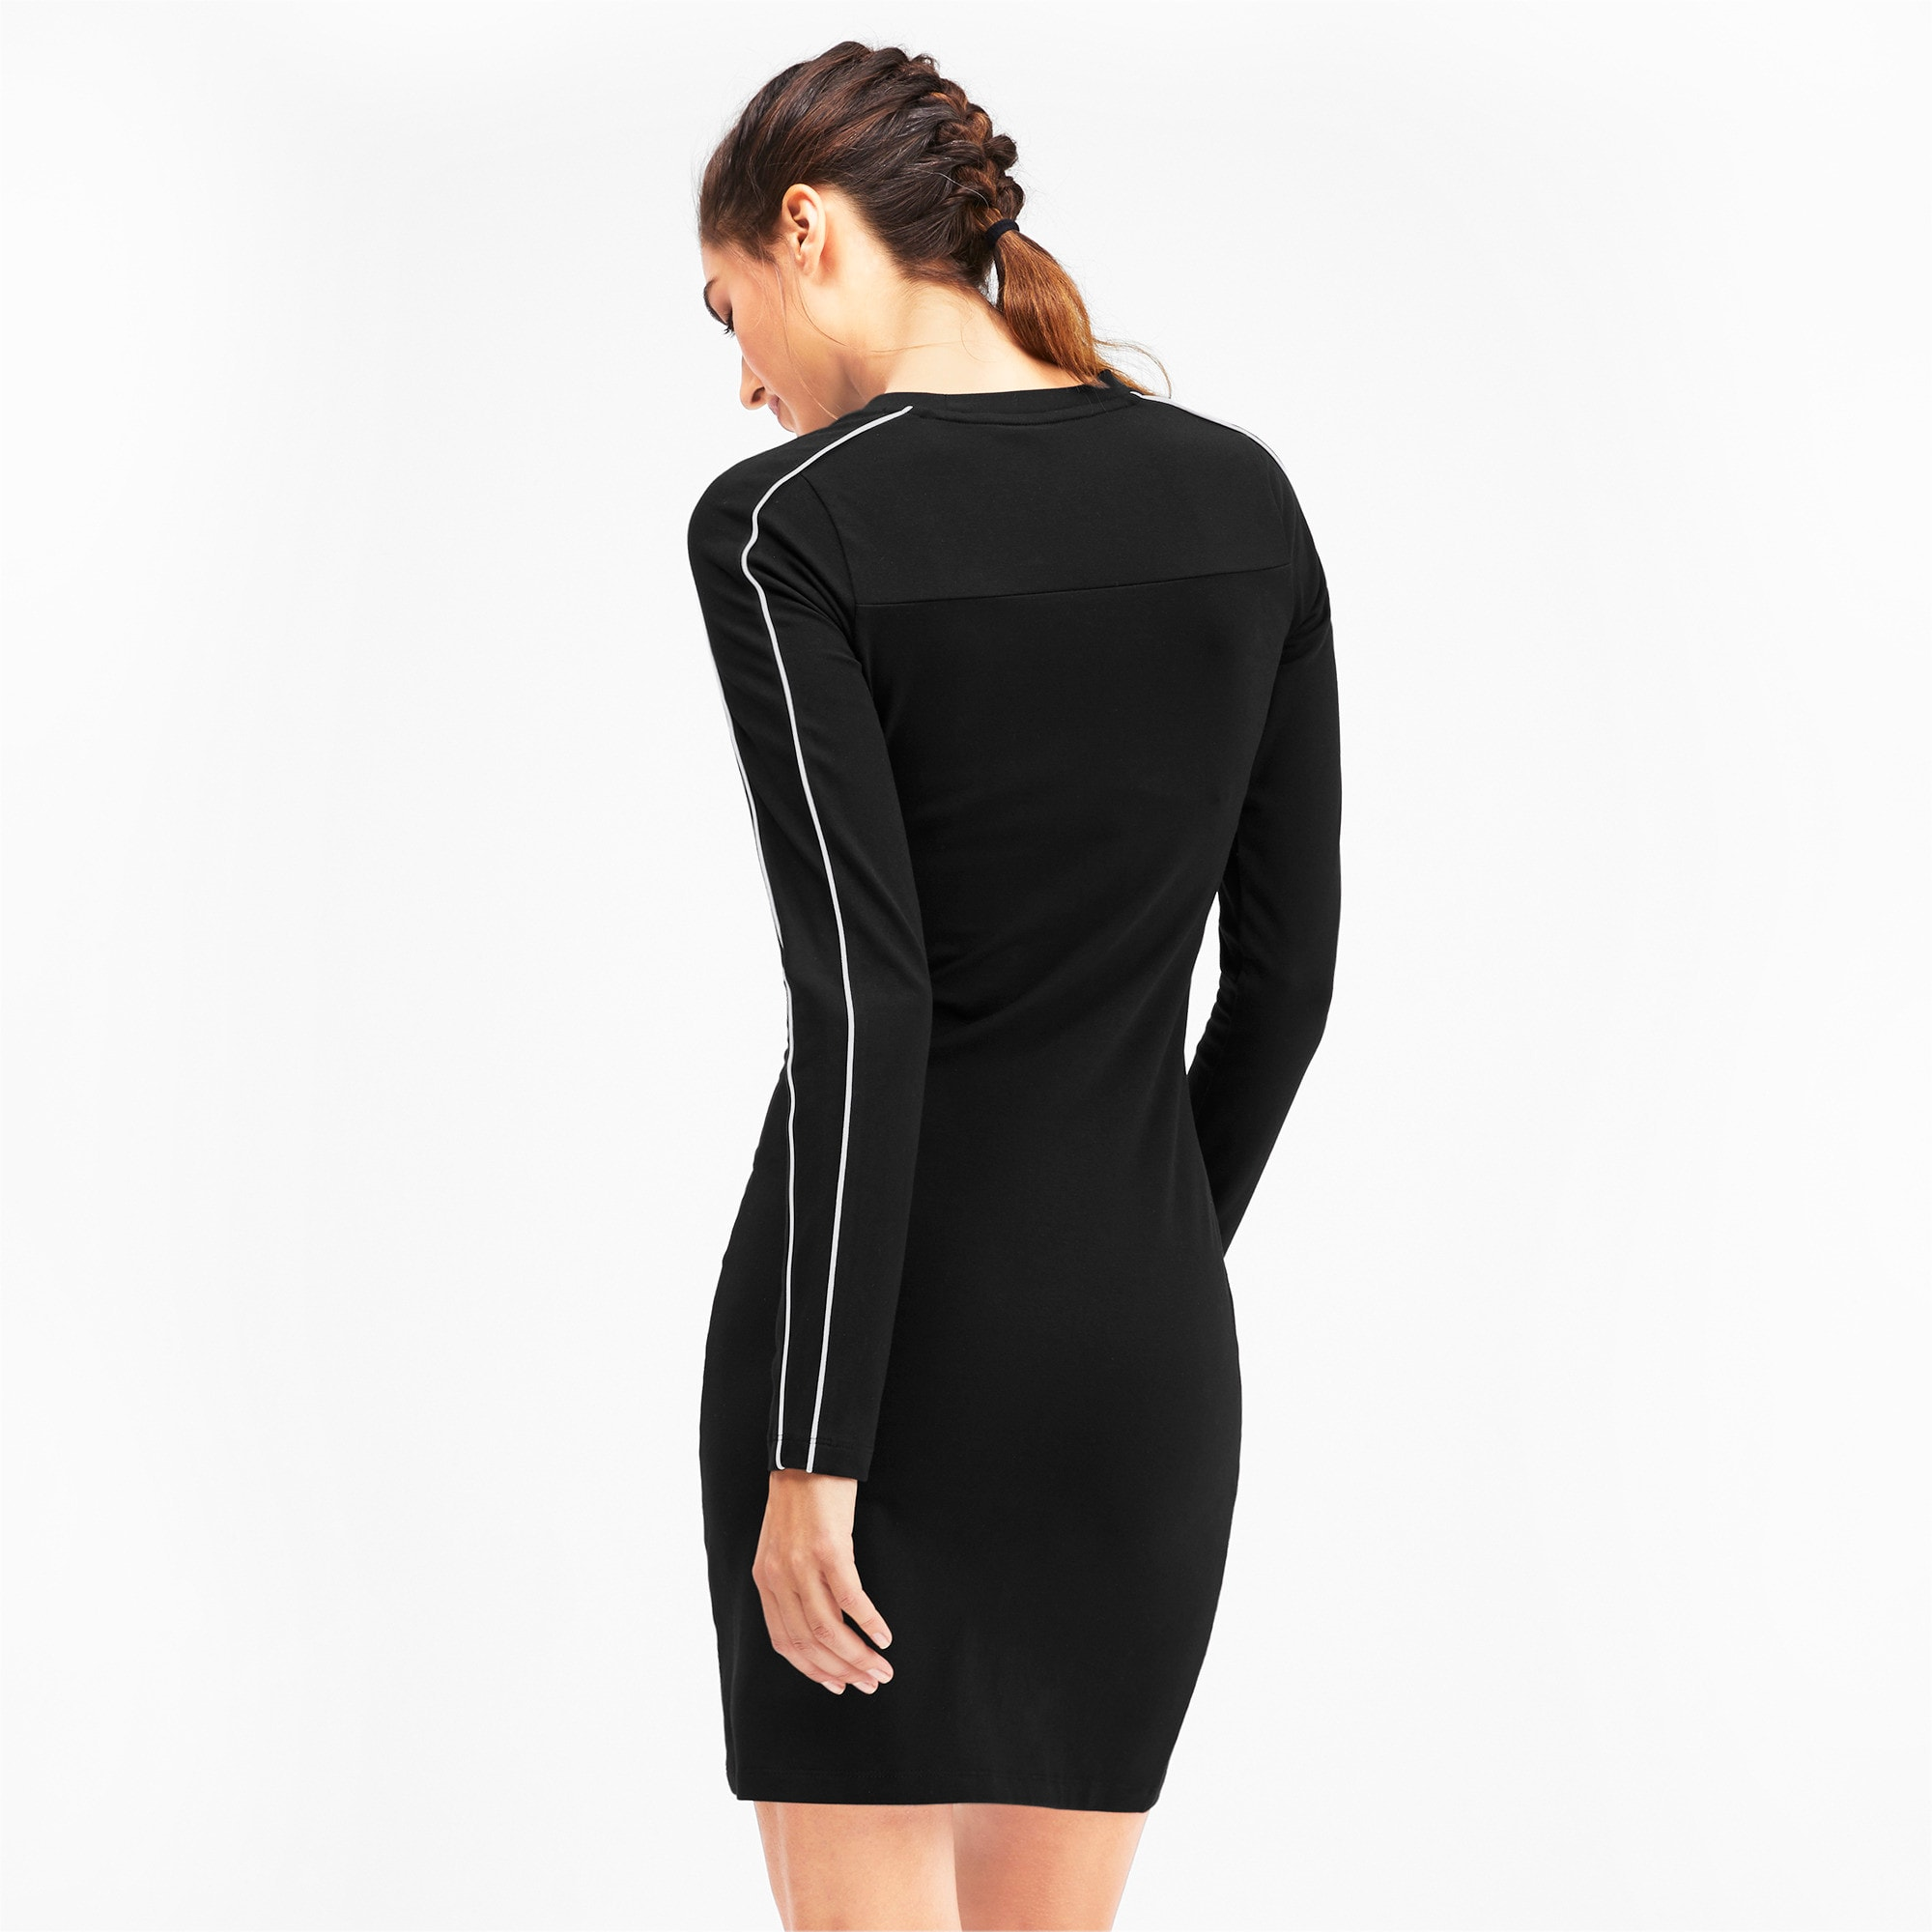 Thumbnail 2 of Classics Women's Dress, Puma Black, medium